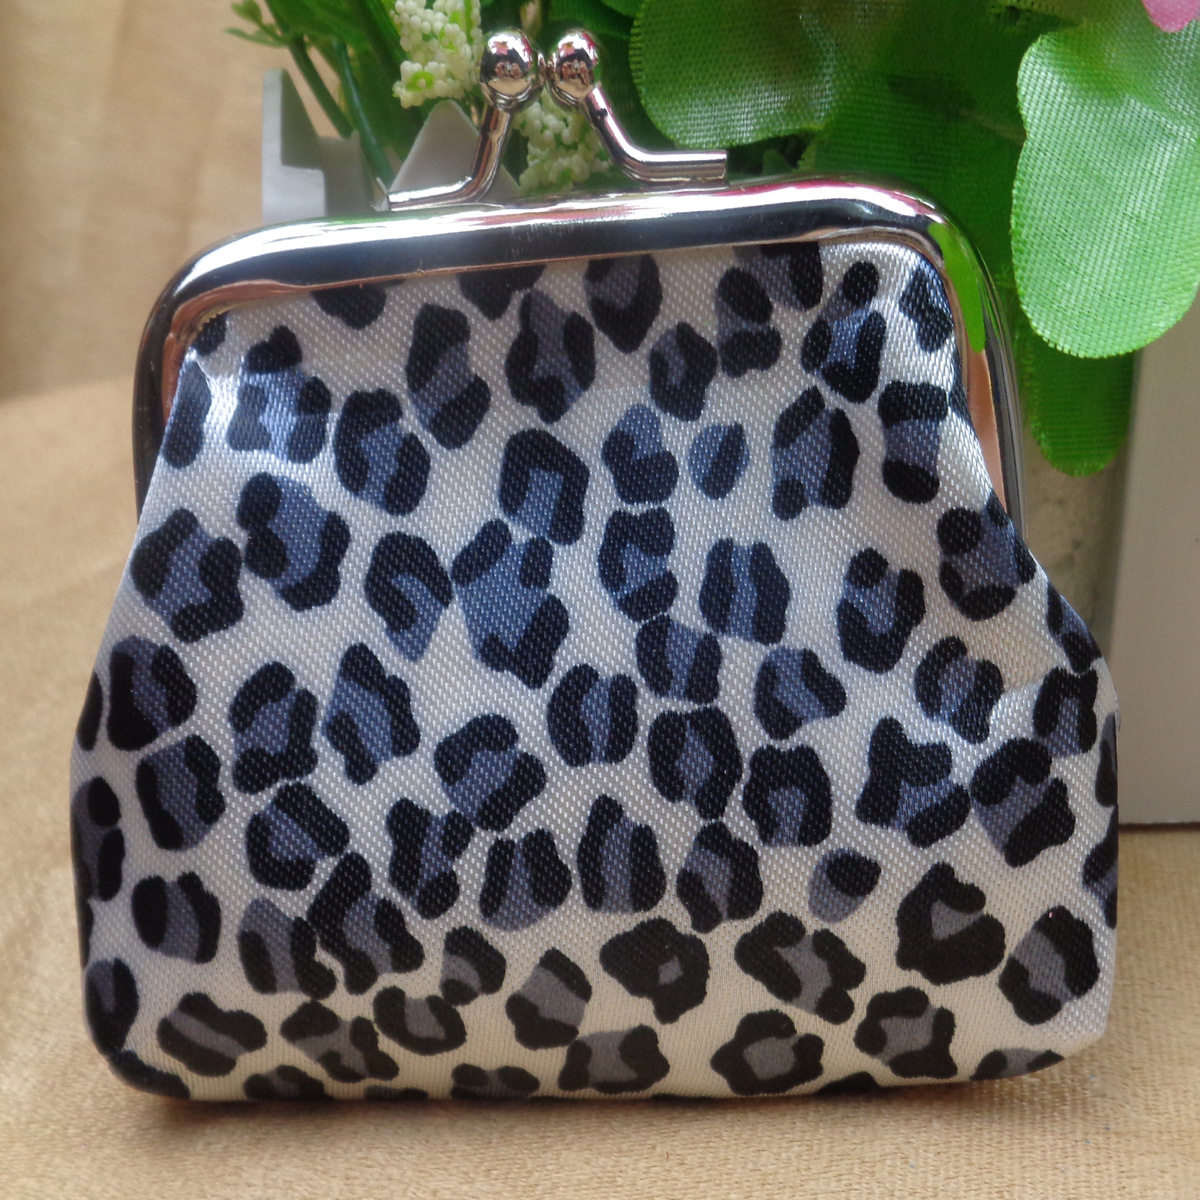 Купить с кэшбэком Leopard coin small coin purse buckle fabric coin purse mini coin purse mini bag  clear purse  leather coin purse women